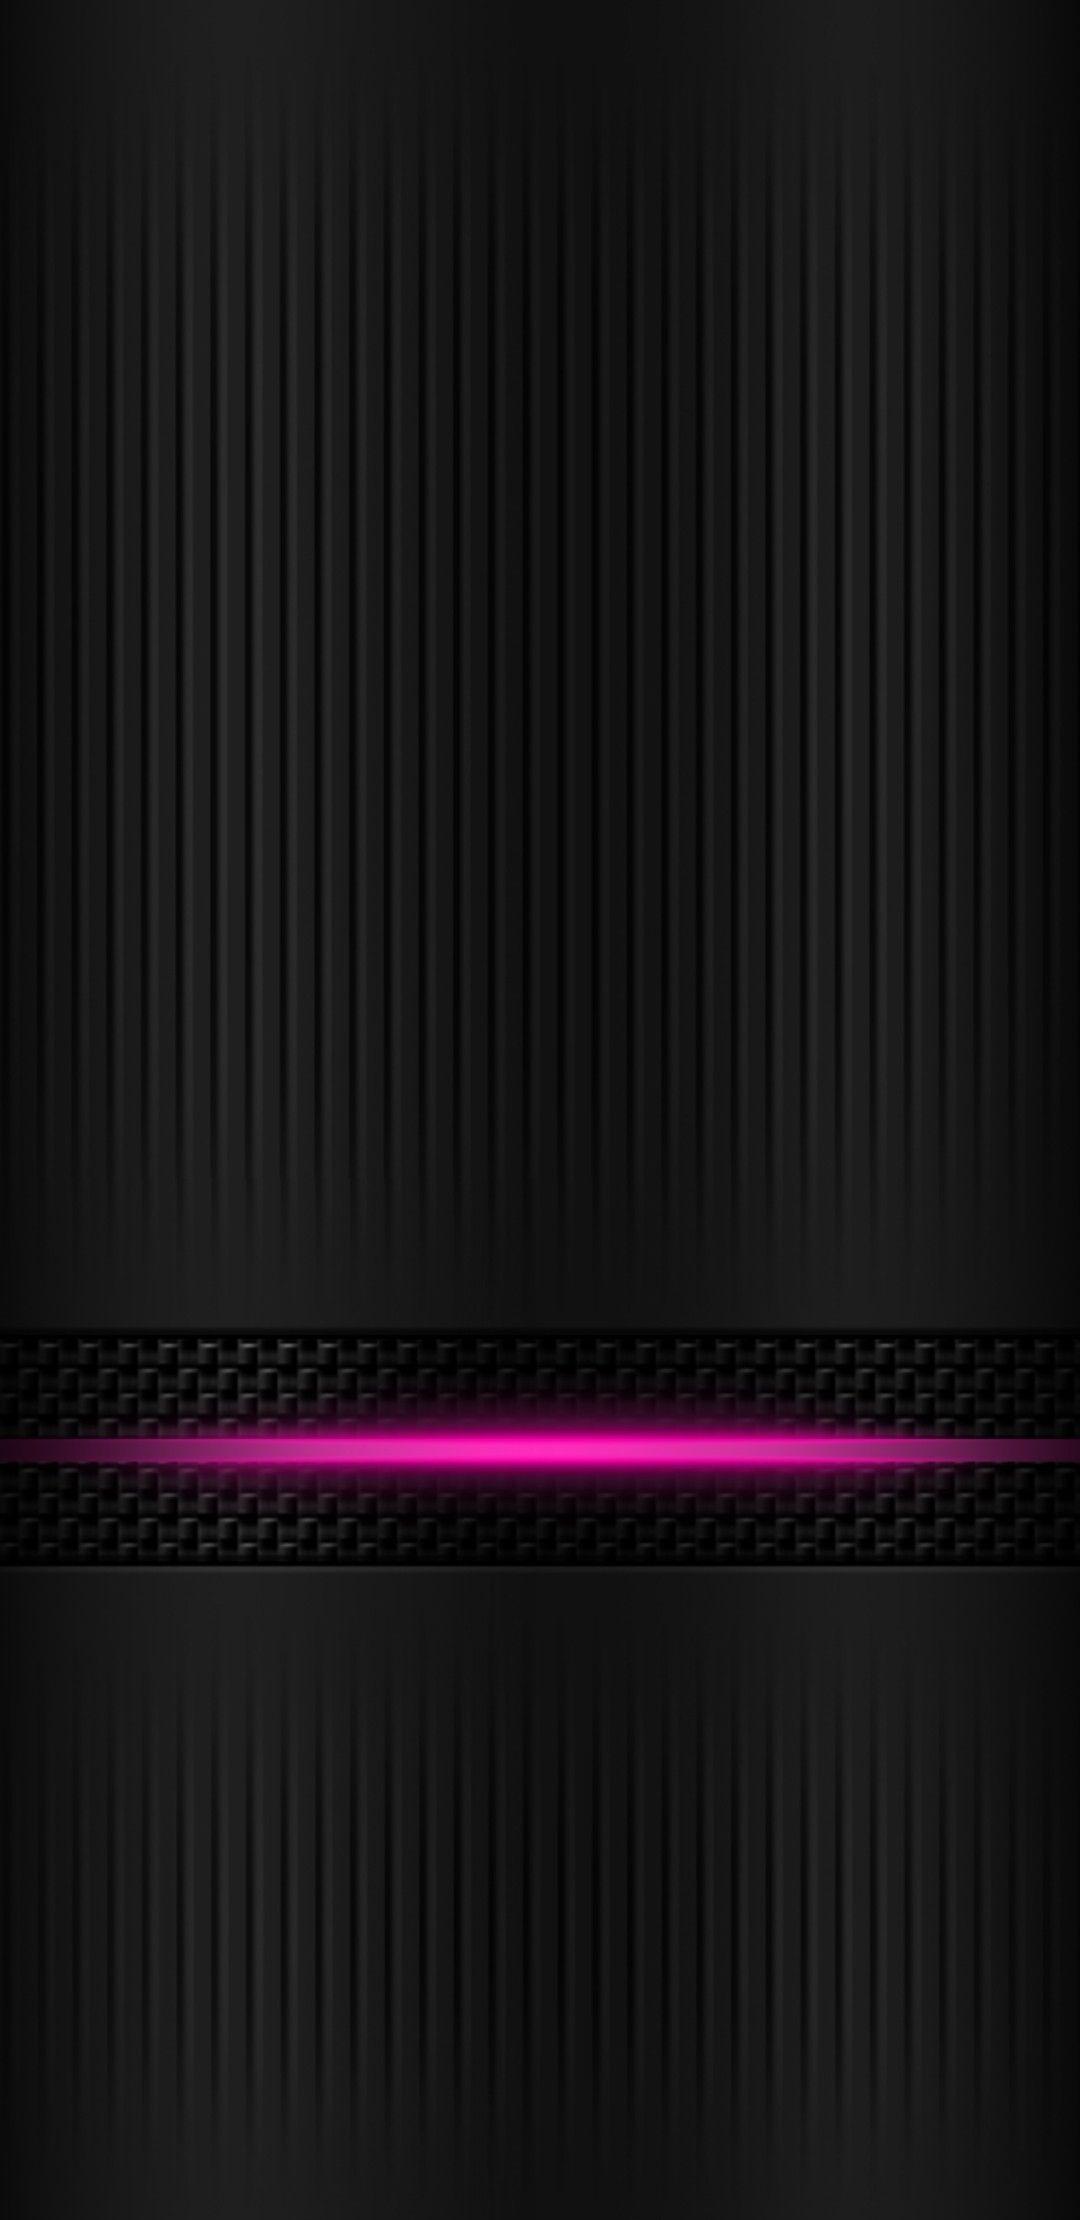 Pin By Rachel Louise Guthridge On Pinkz Wall Paper Phone Pink And Black Wallpaper Wallpaper